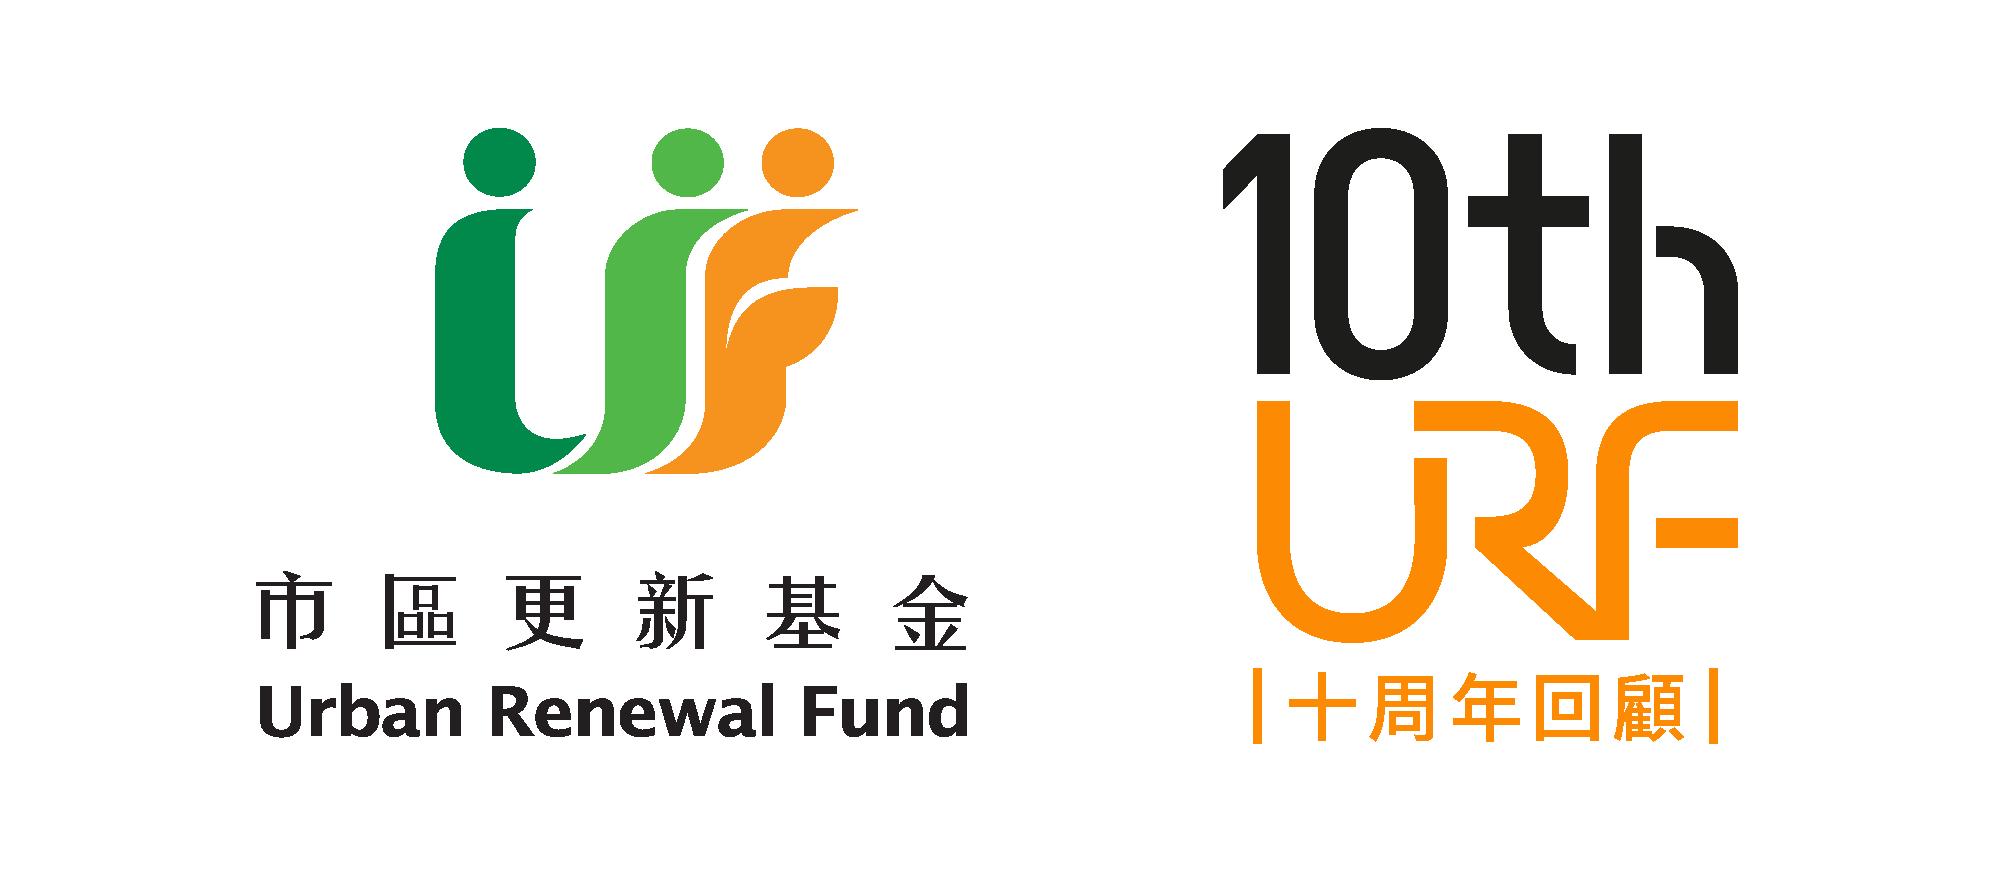 Urban Renewal Fund